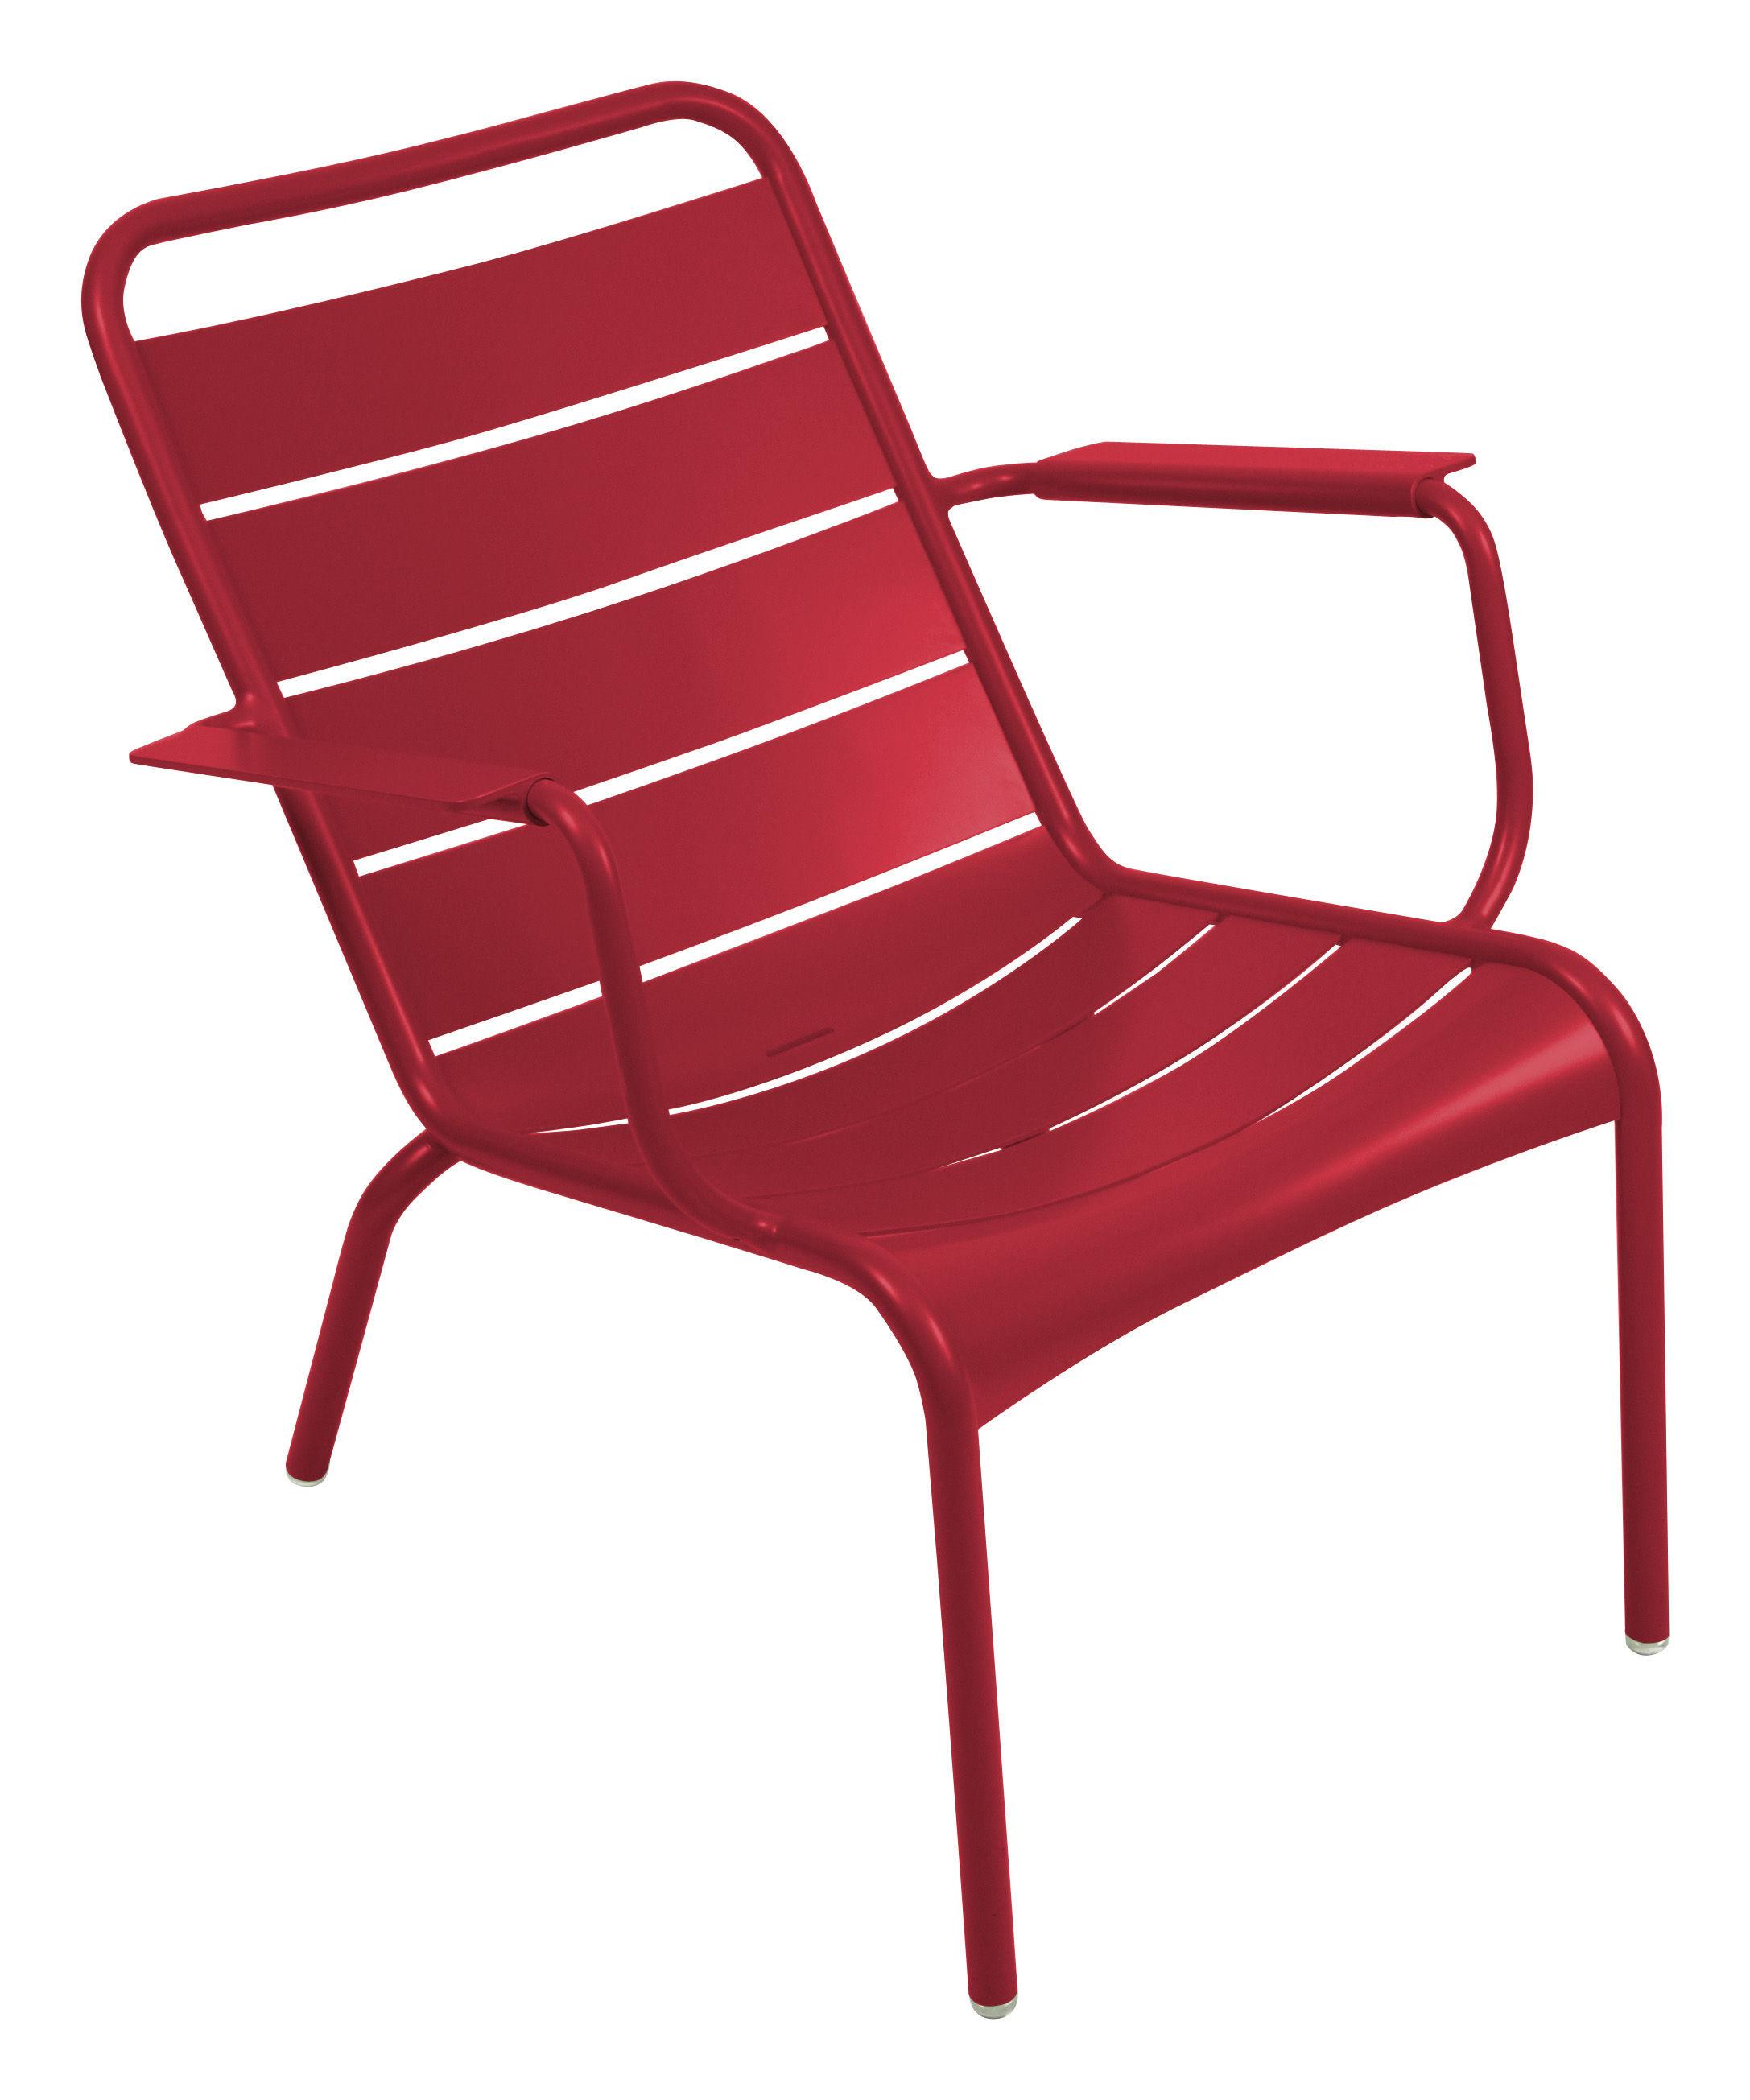 fauteuil bas luxembourg aluminium piment fermob. Black Bedroom Furniture Sets. Home Design Ideas